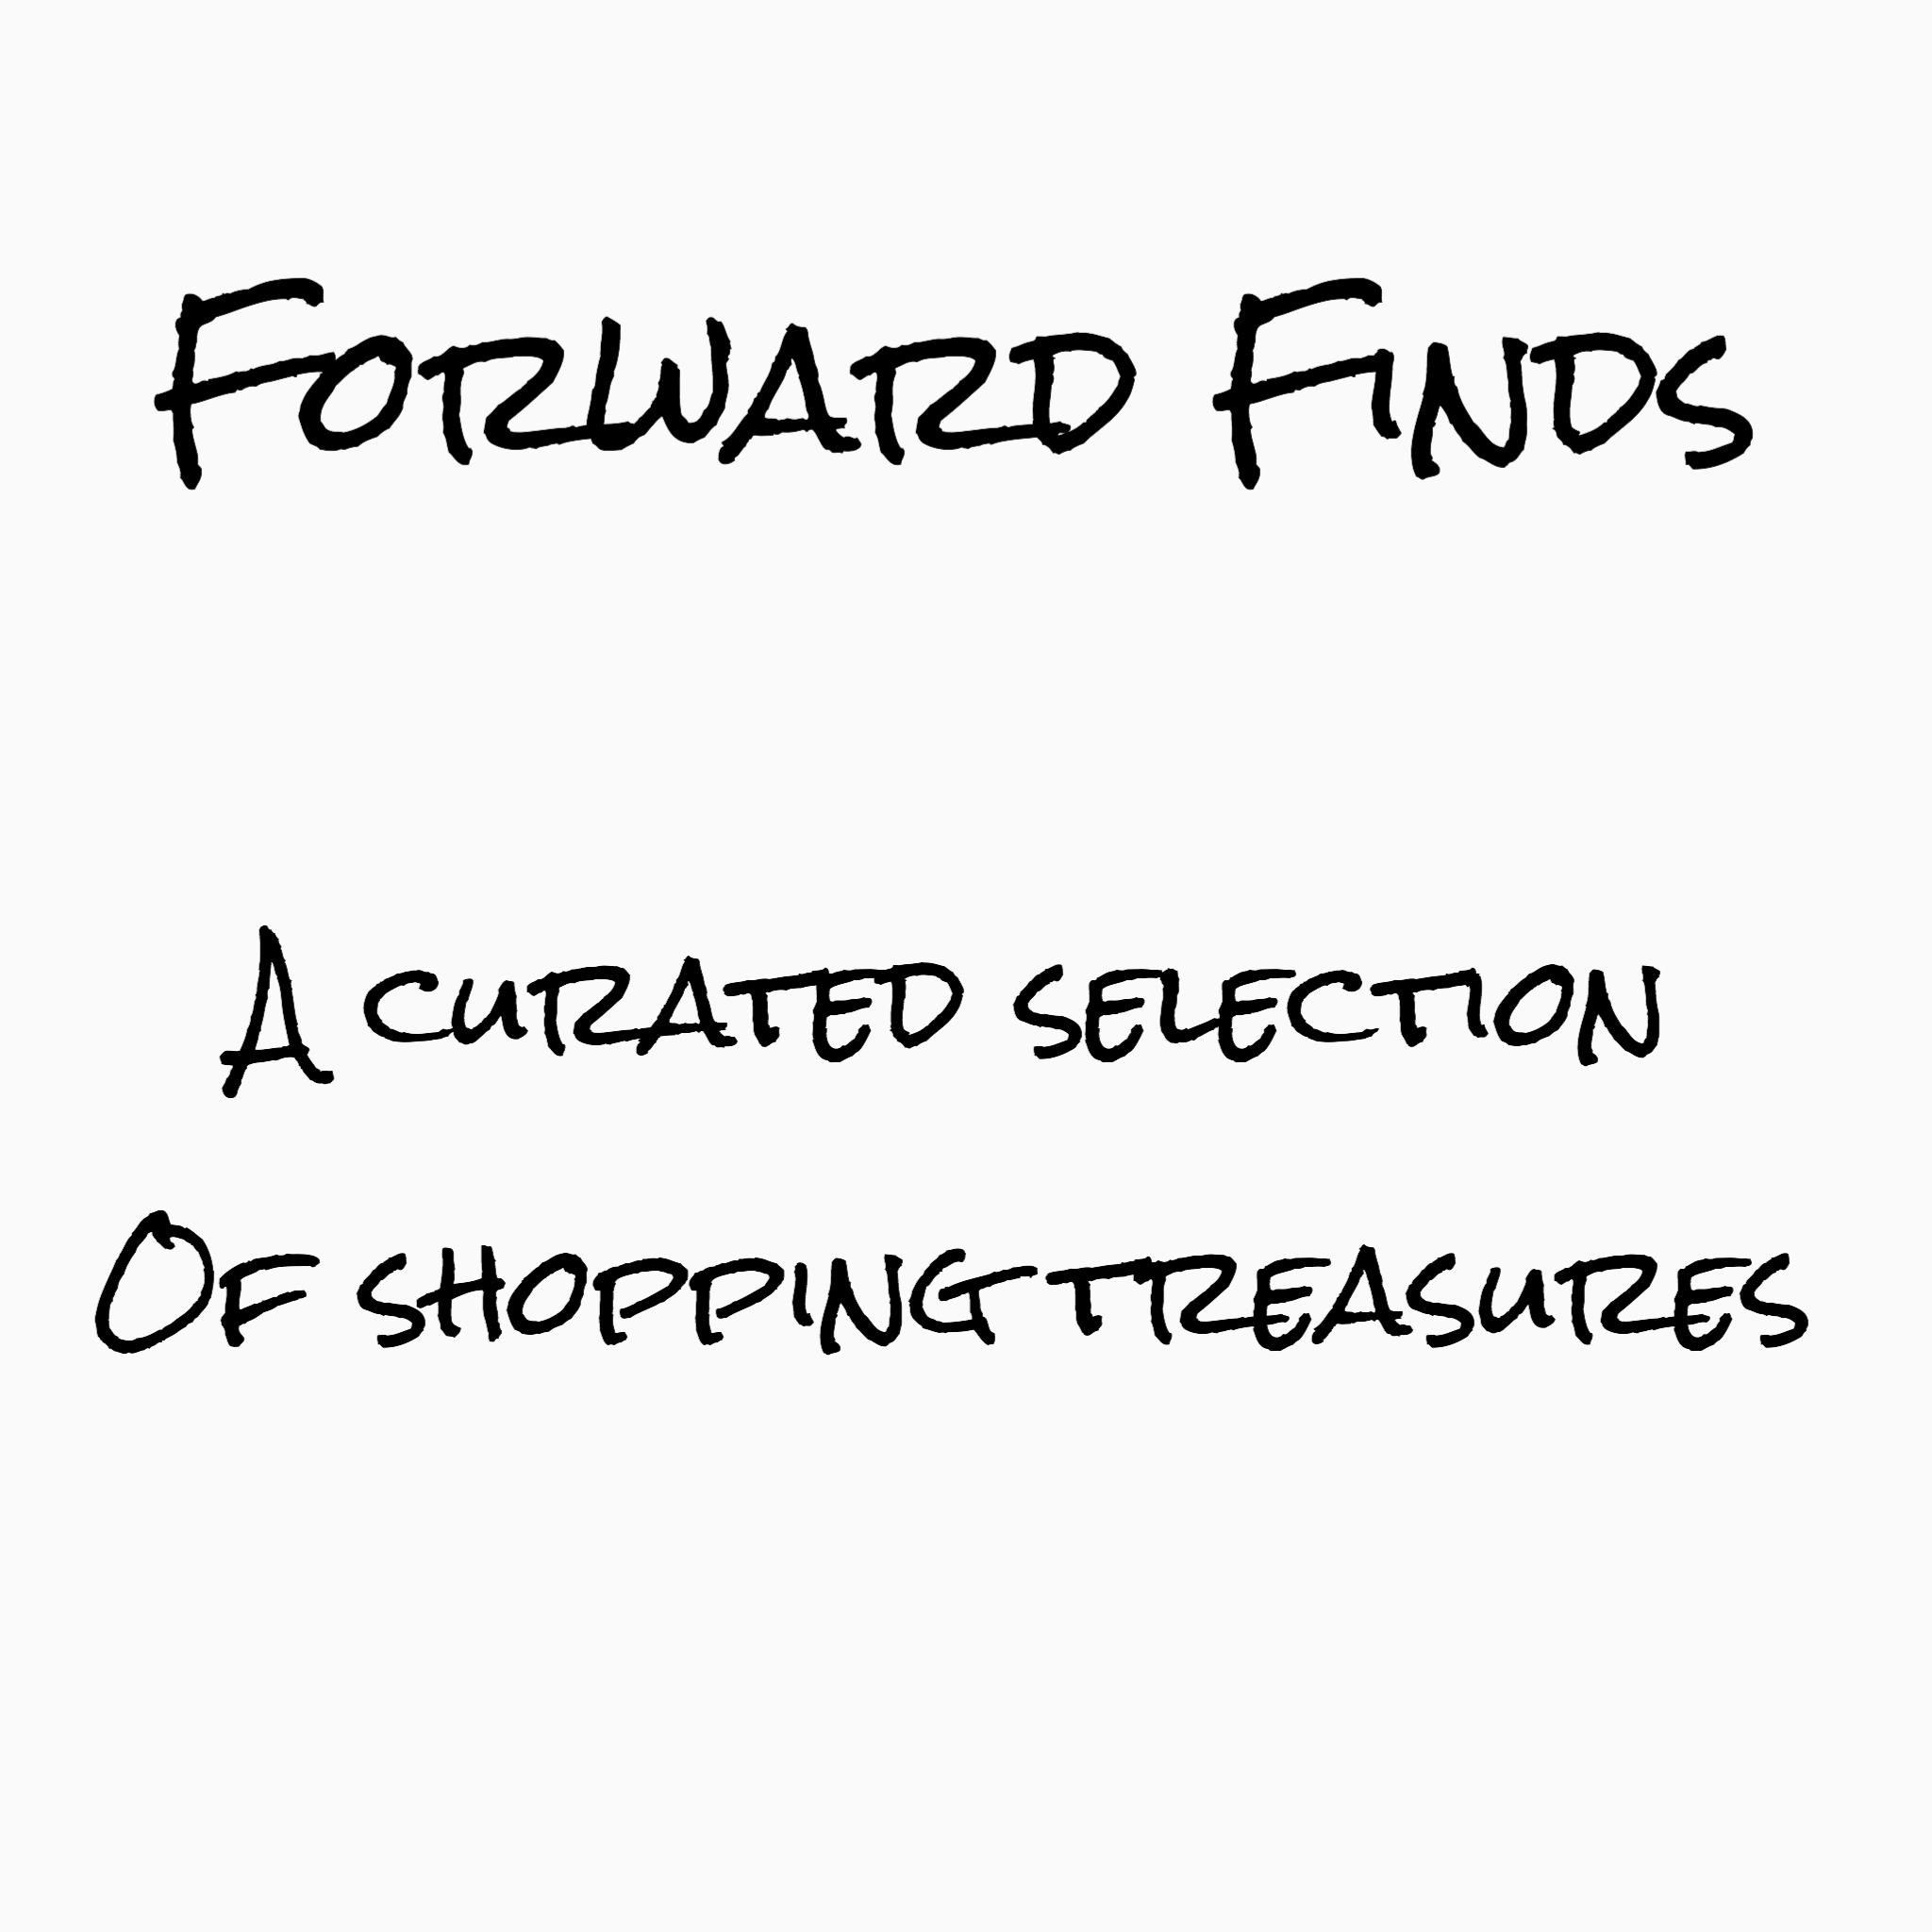 Forward Finds logo